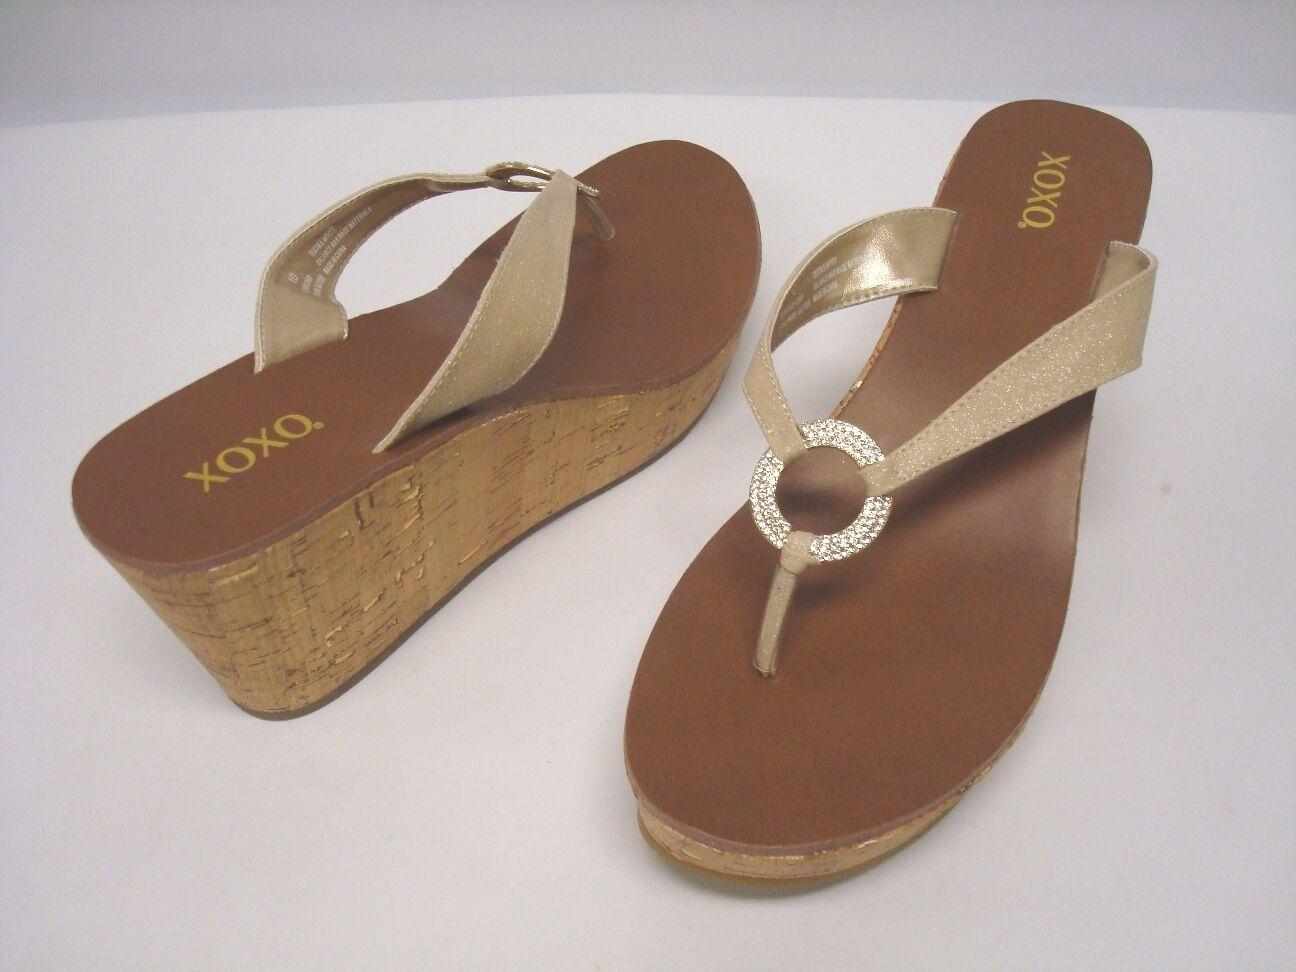 "NIB XOXO Footwear Wedge Sandals  Nude ""Glitter""  Size 9  Jeweled Accent"